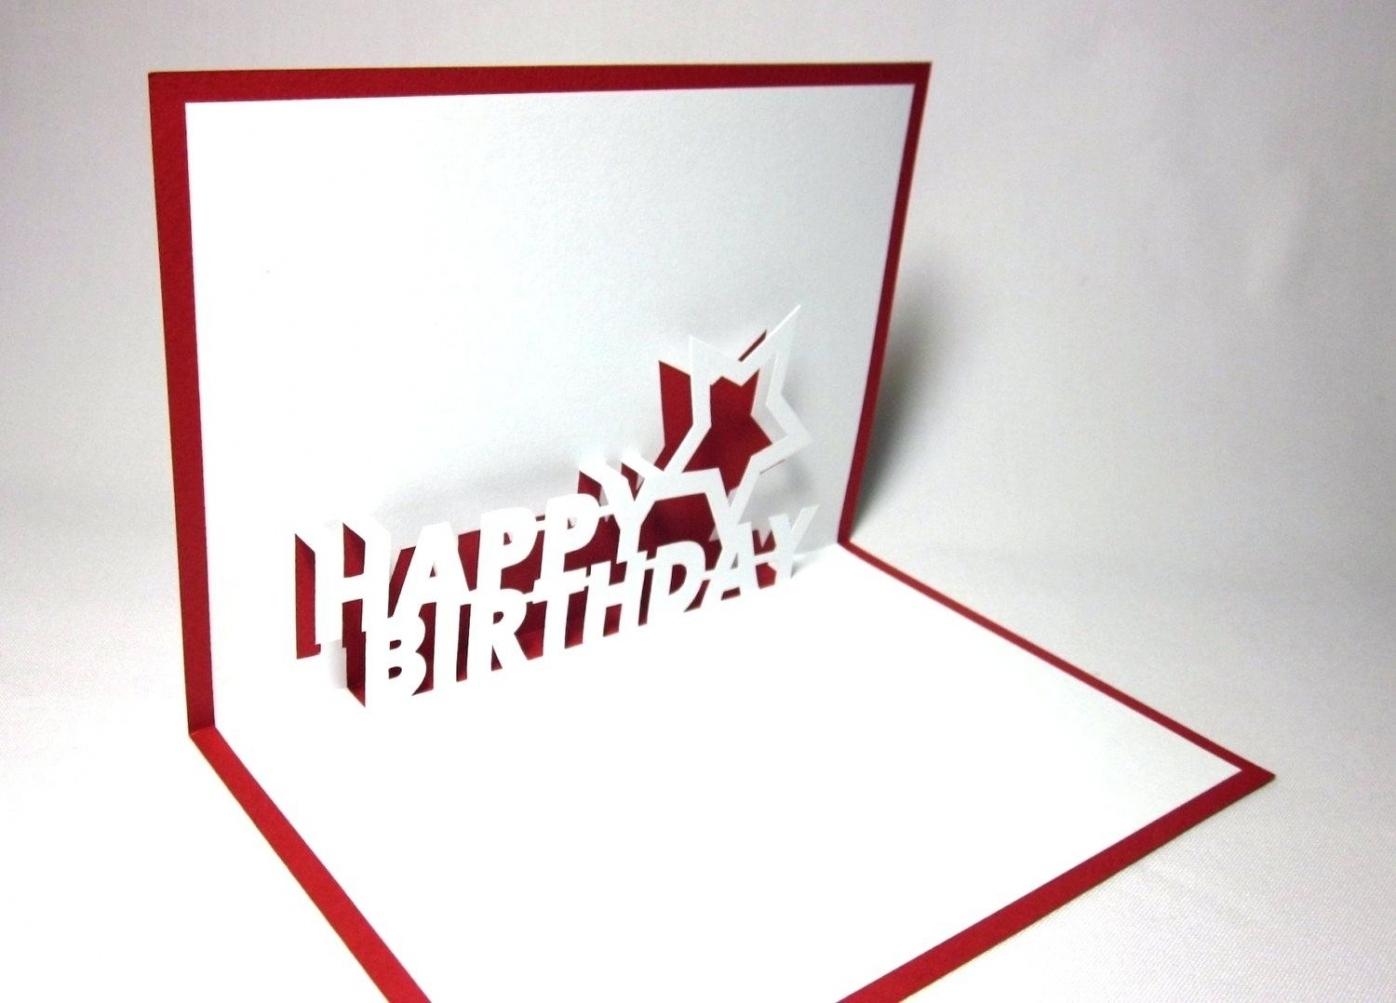 009 Pop Up Birthday Card Template Ideas Inspirational Free Printable - Free Printable Pop Up Birthday Card Templates